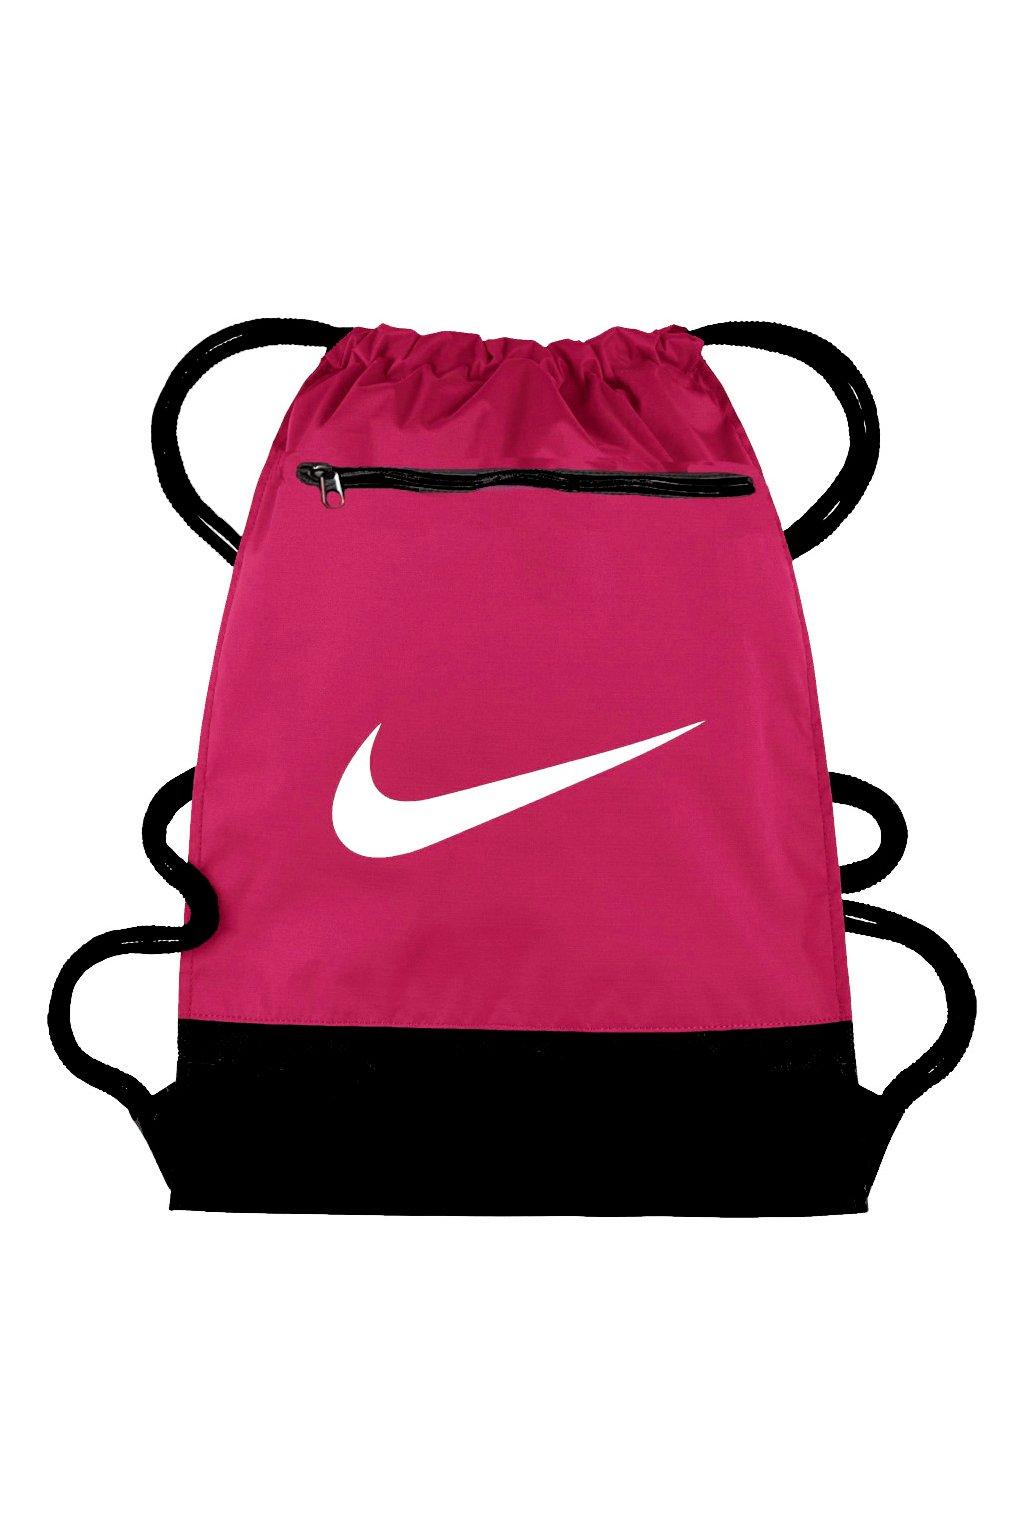 Vak na obuv Nike Brasilia 9.0 ružový BA5953 666